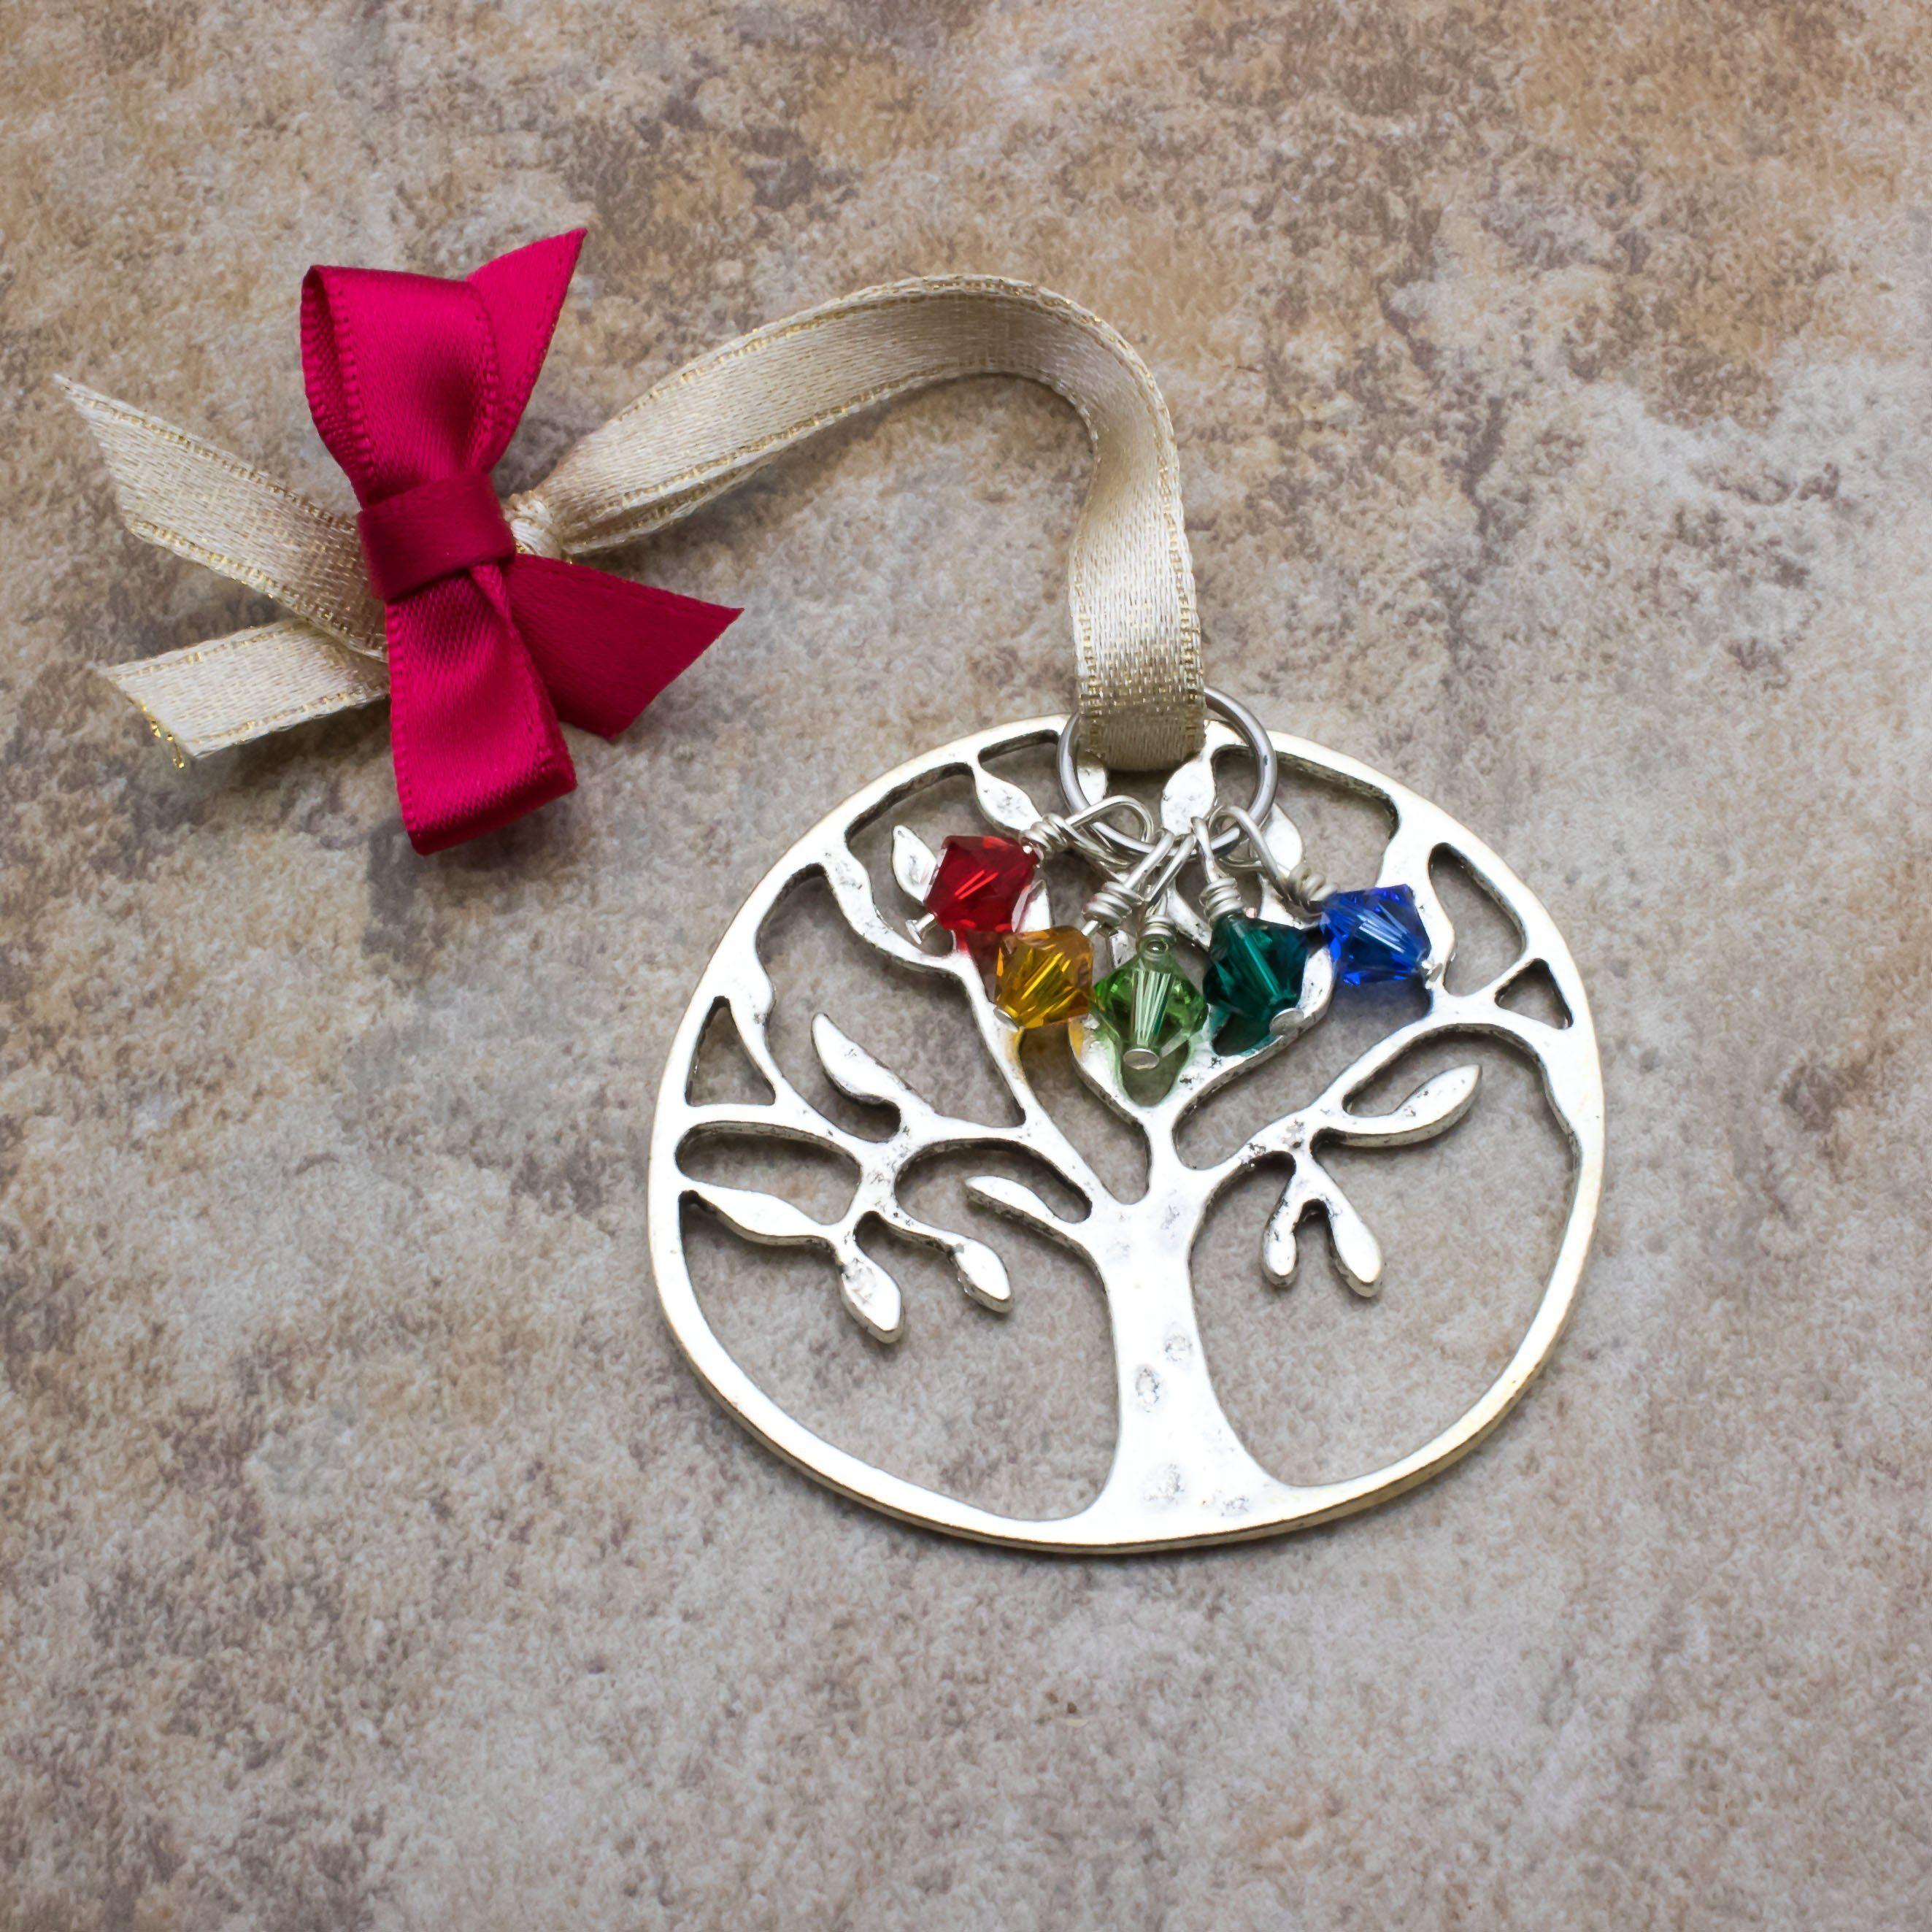 Personalized Christmas Tree /& Birthstone Charm Silver Aluminum Handmade Ornament